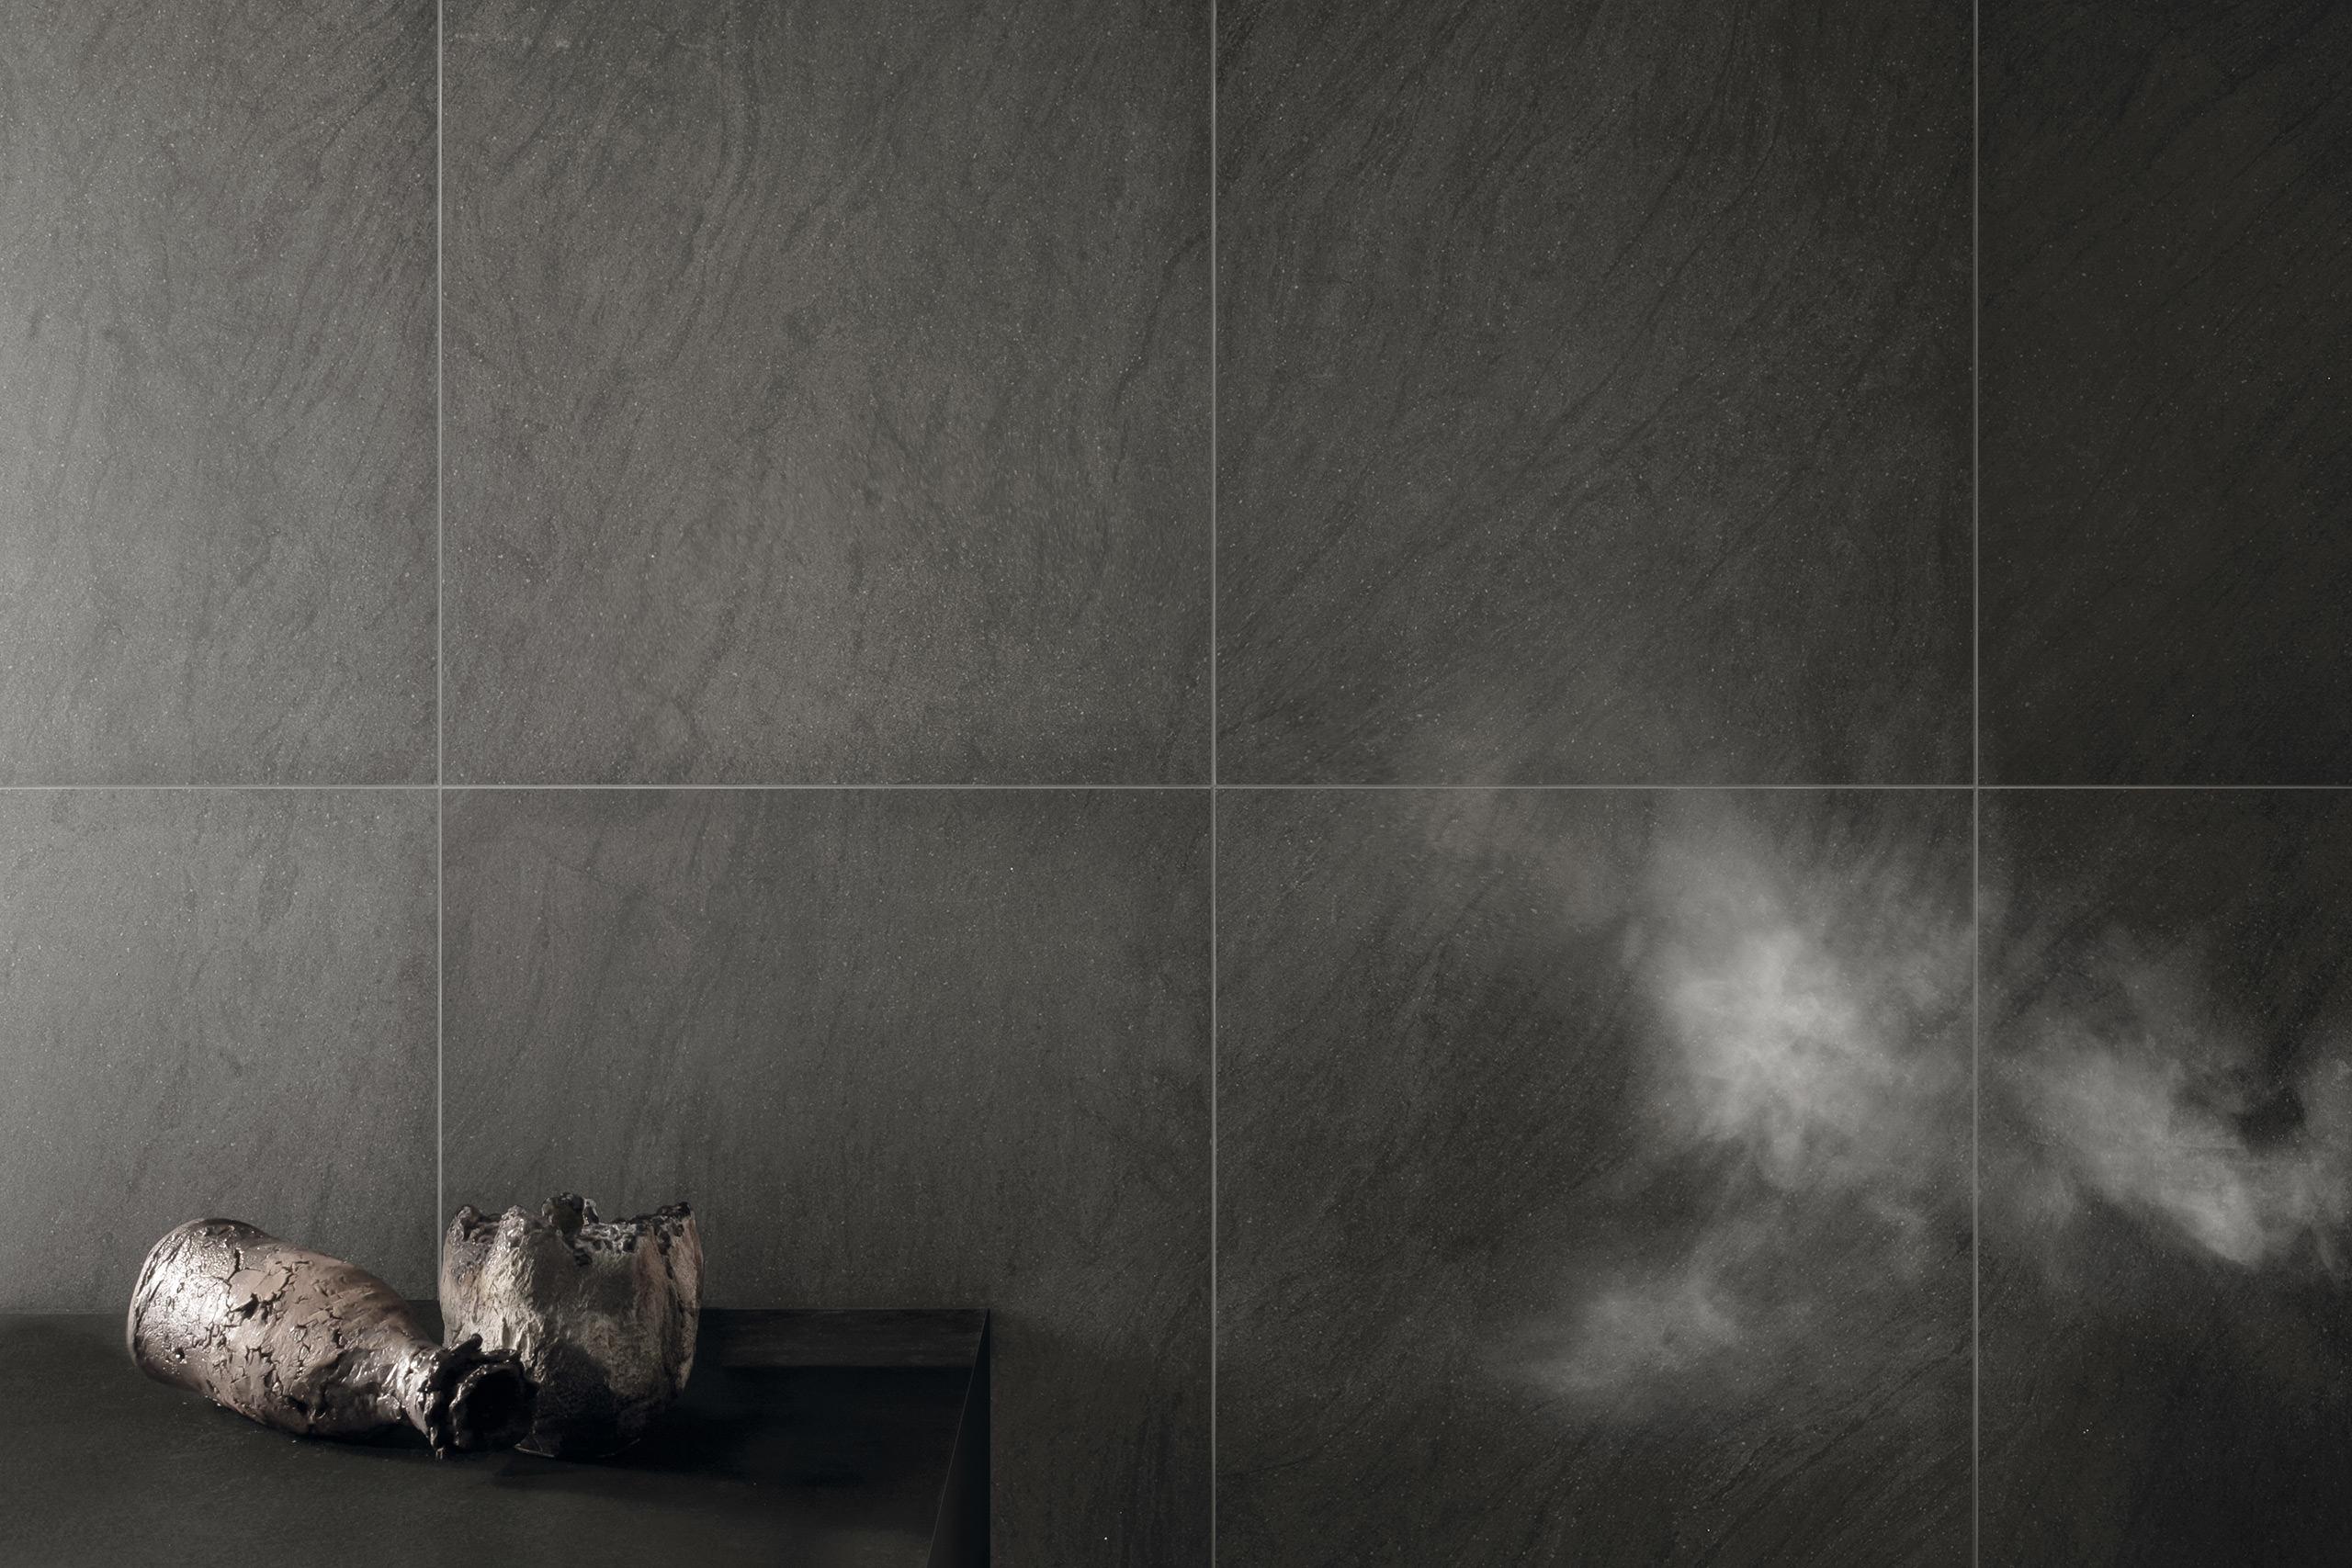 Rendering esterni interni fotorealistici Caesar parete dettaglio